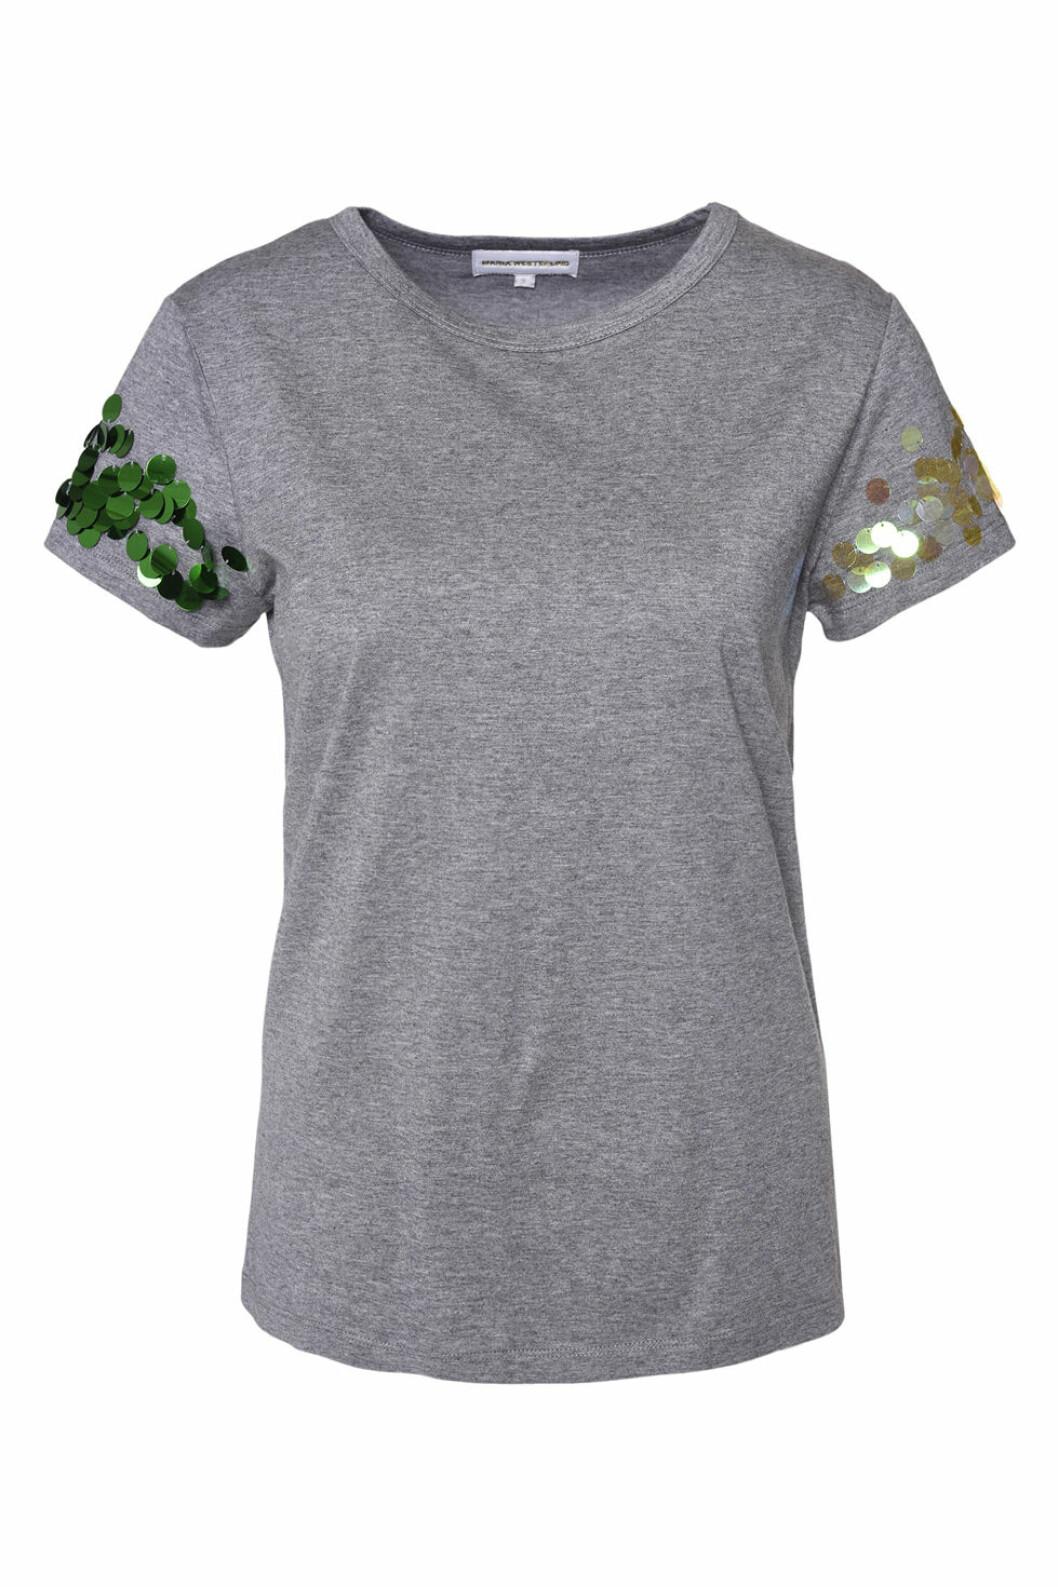 Maria Westerlind x MQ grå t-shirt